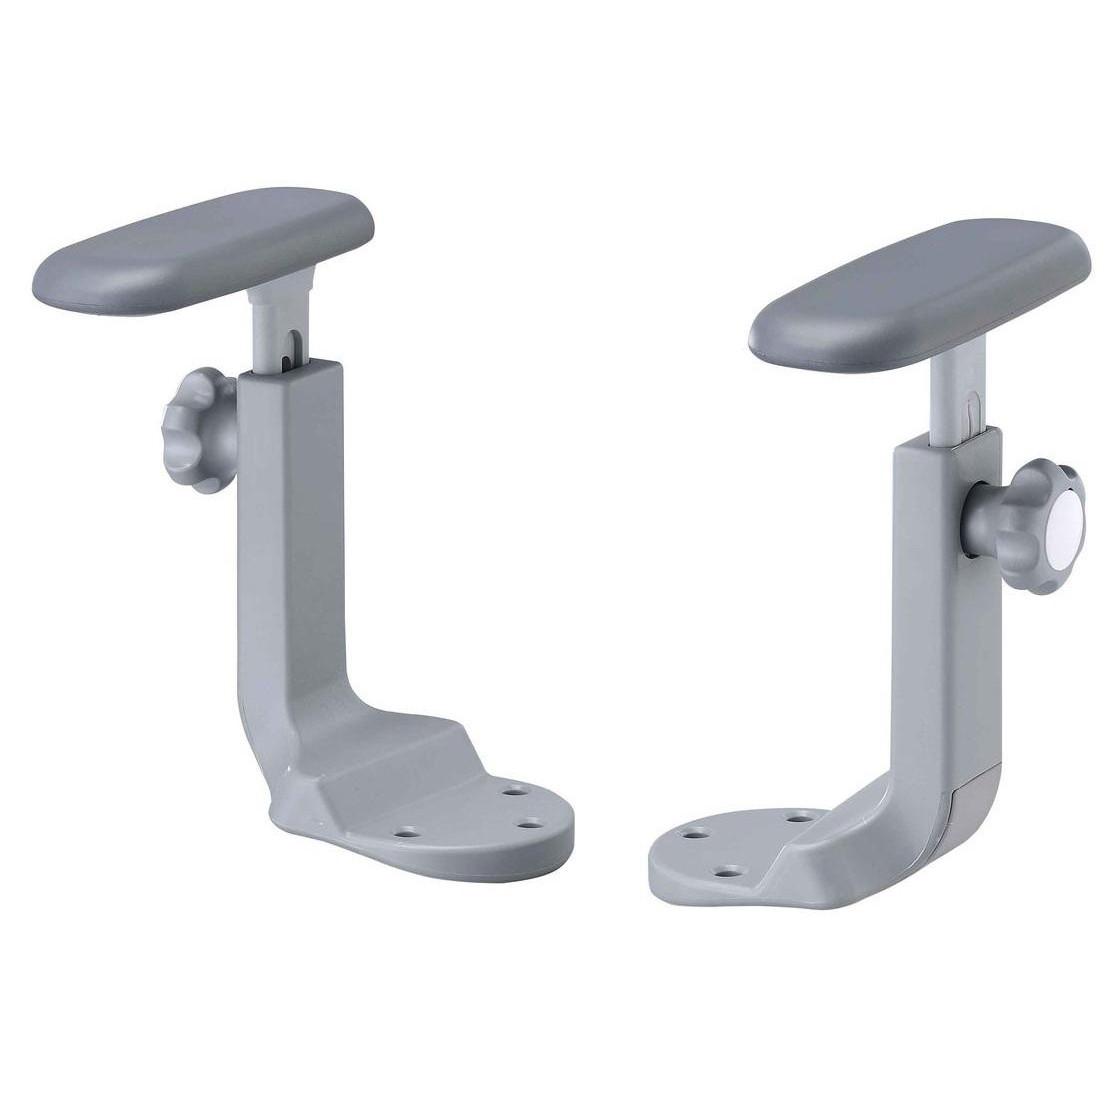 Suport brate scaun Singbee 2